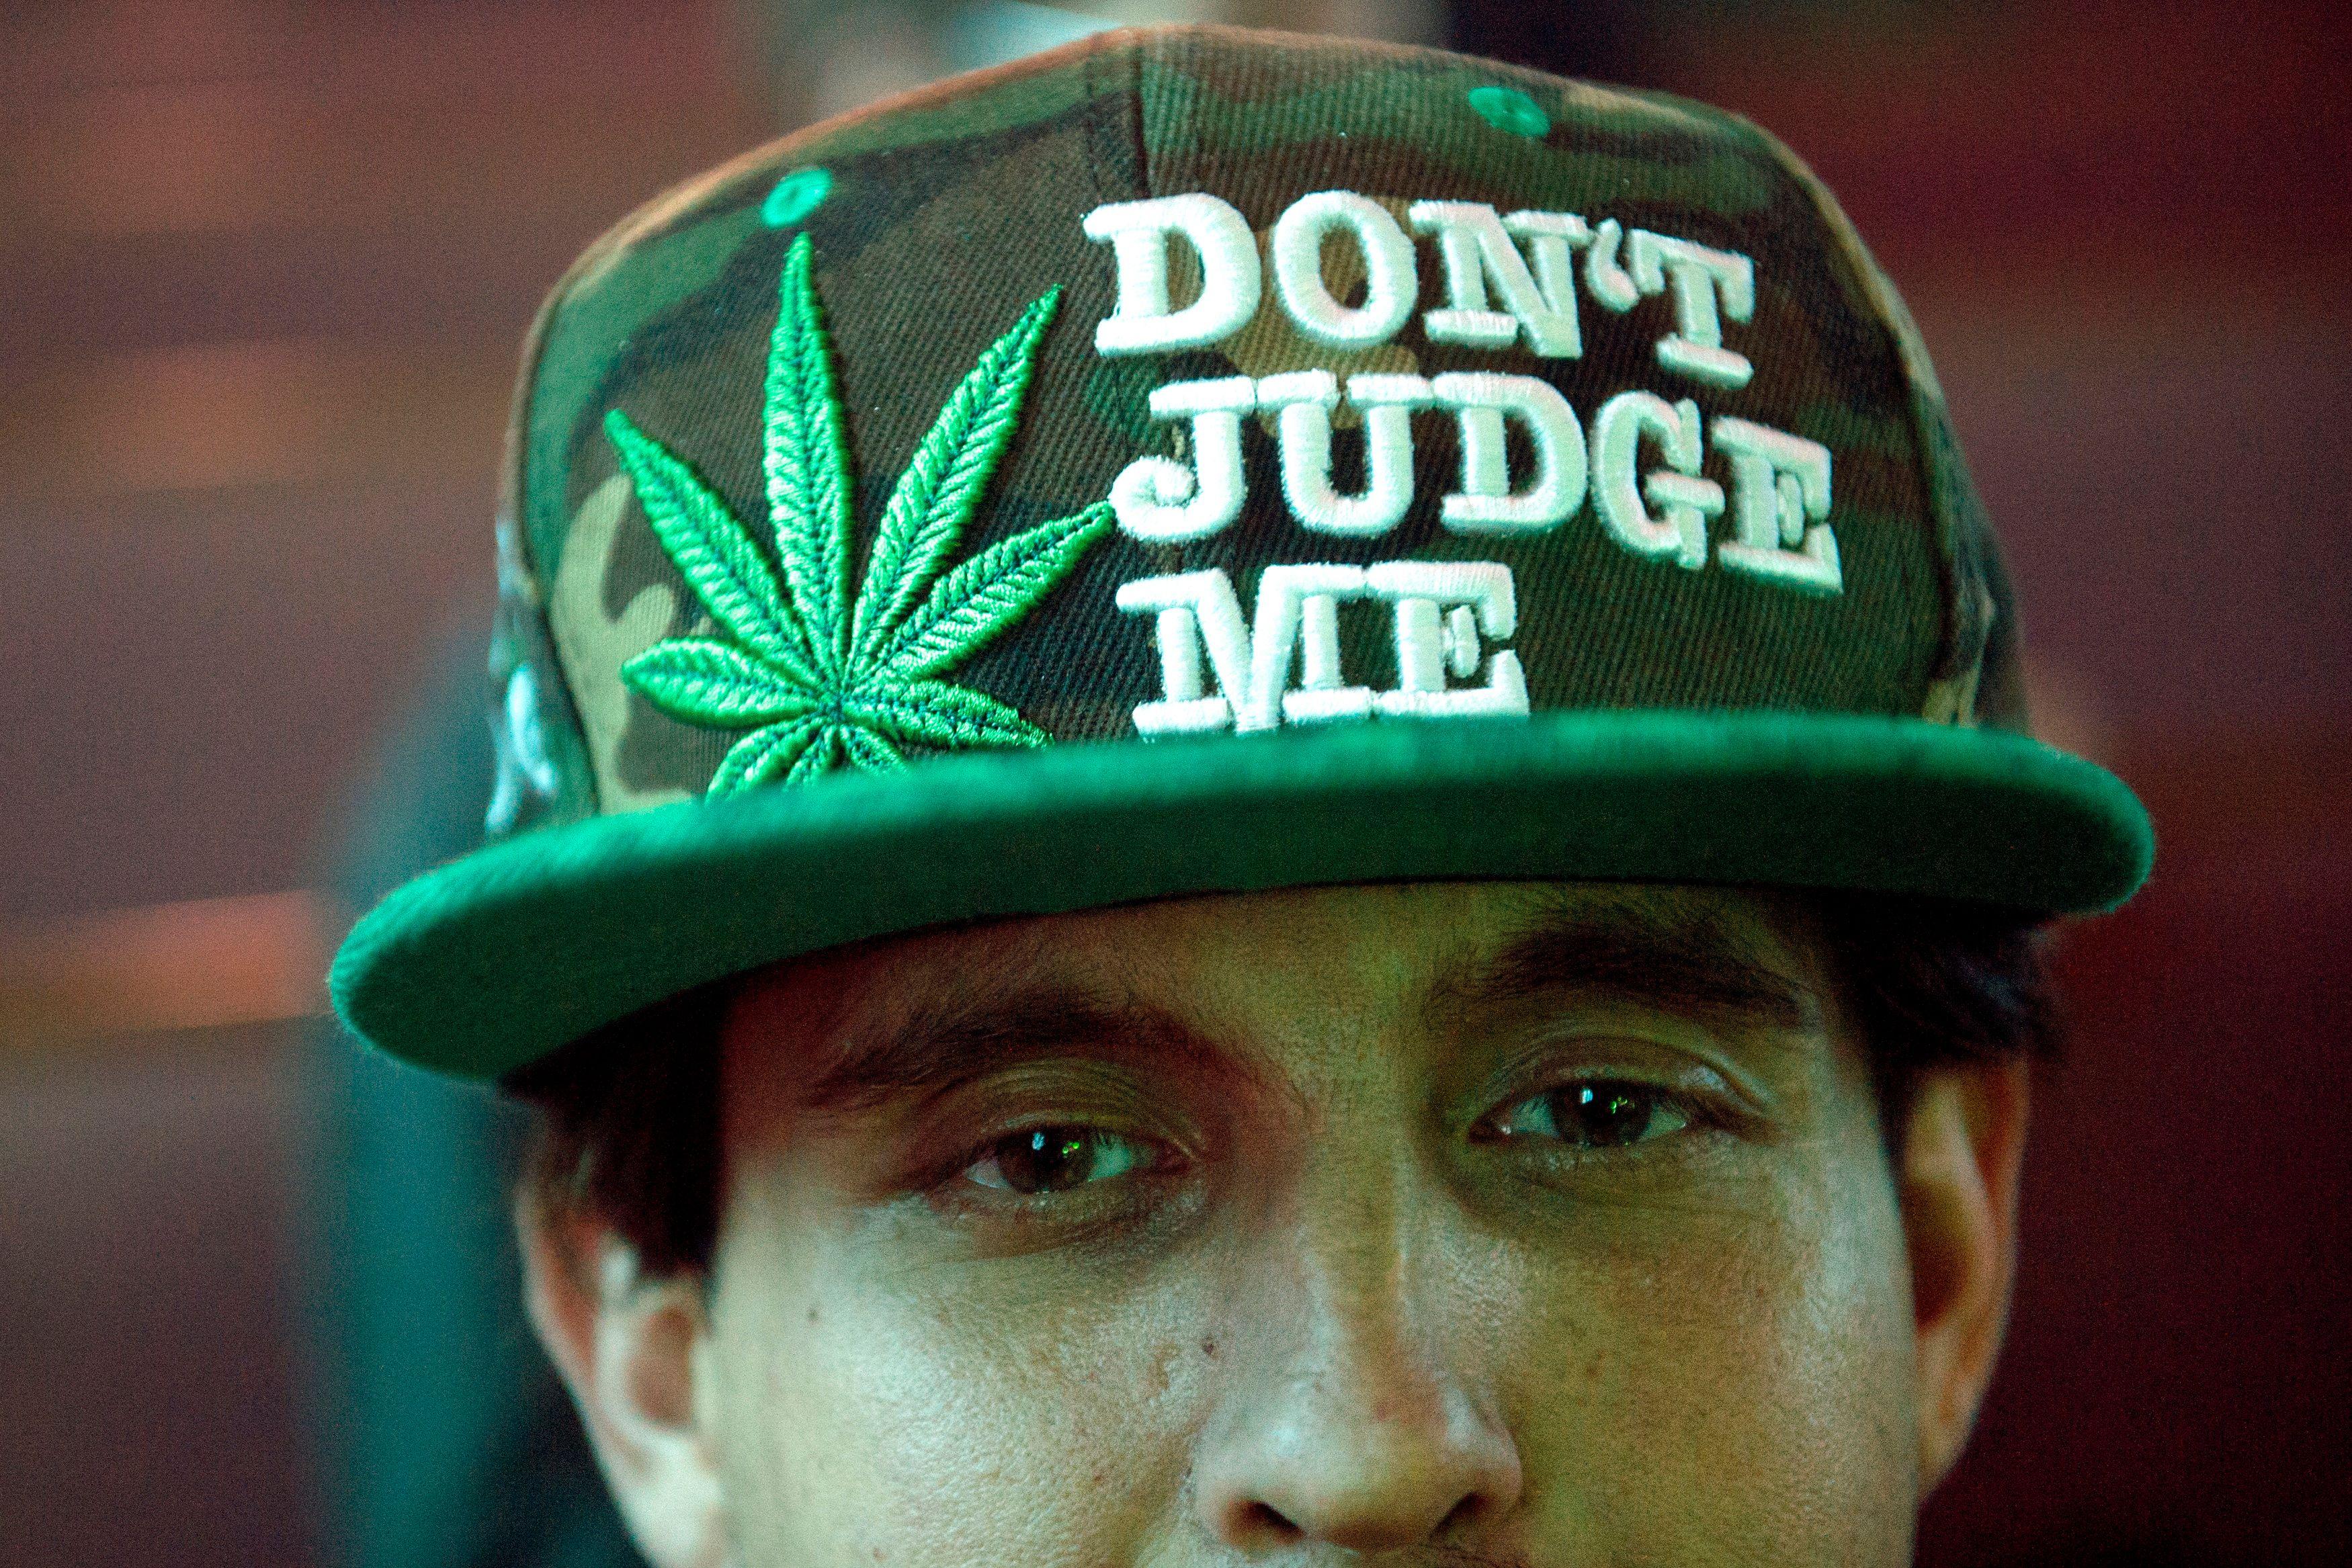 US-RELIGION-DRUG-CANNABIS-LIFESTYLE